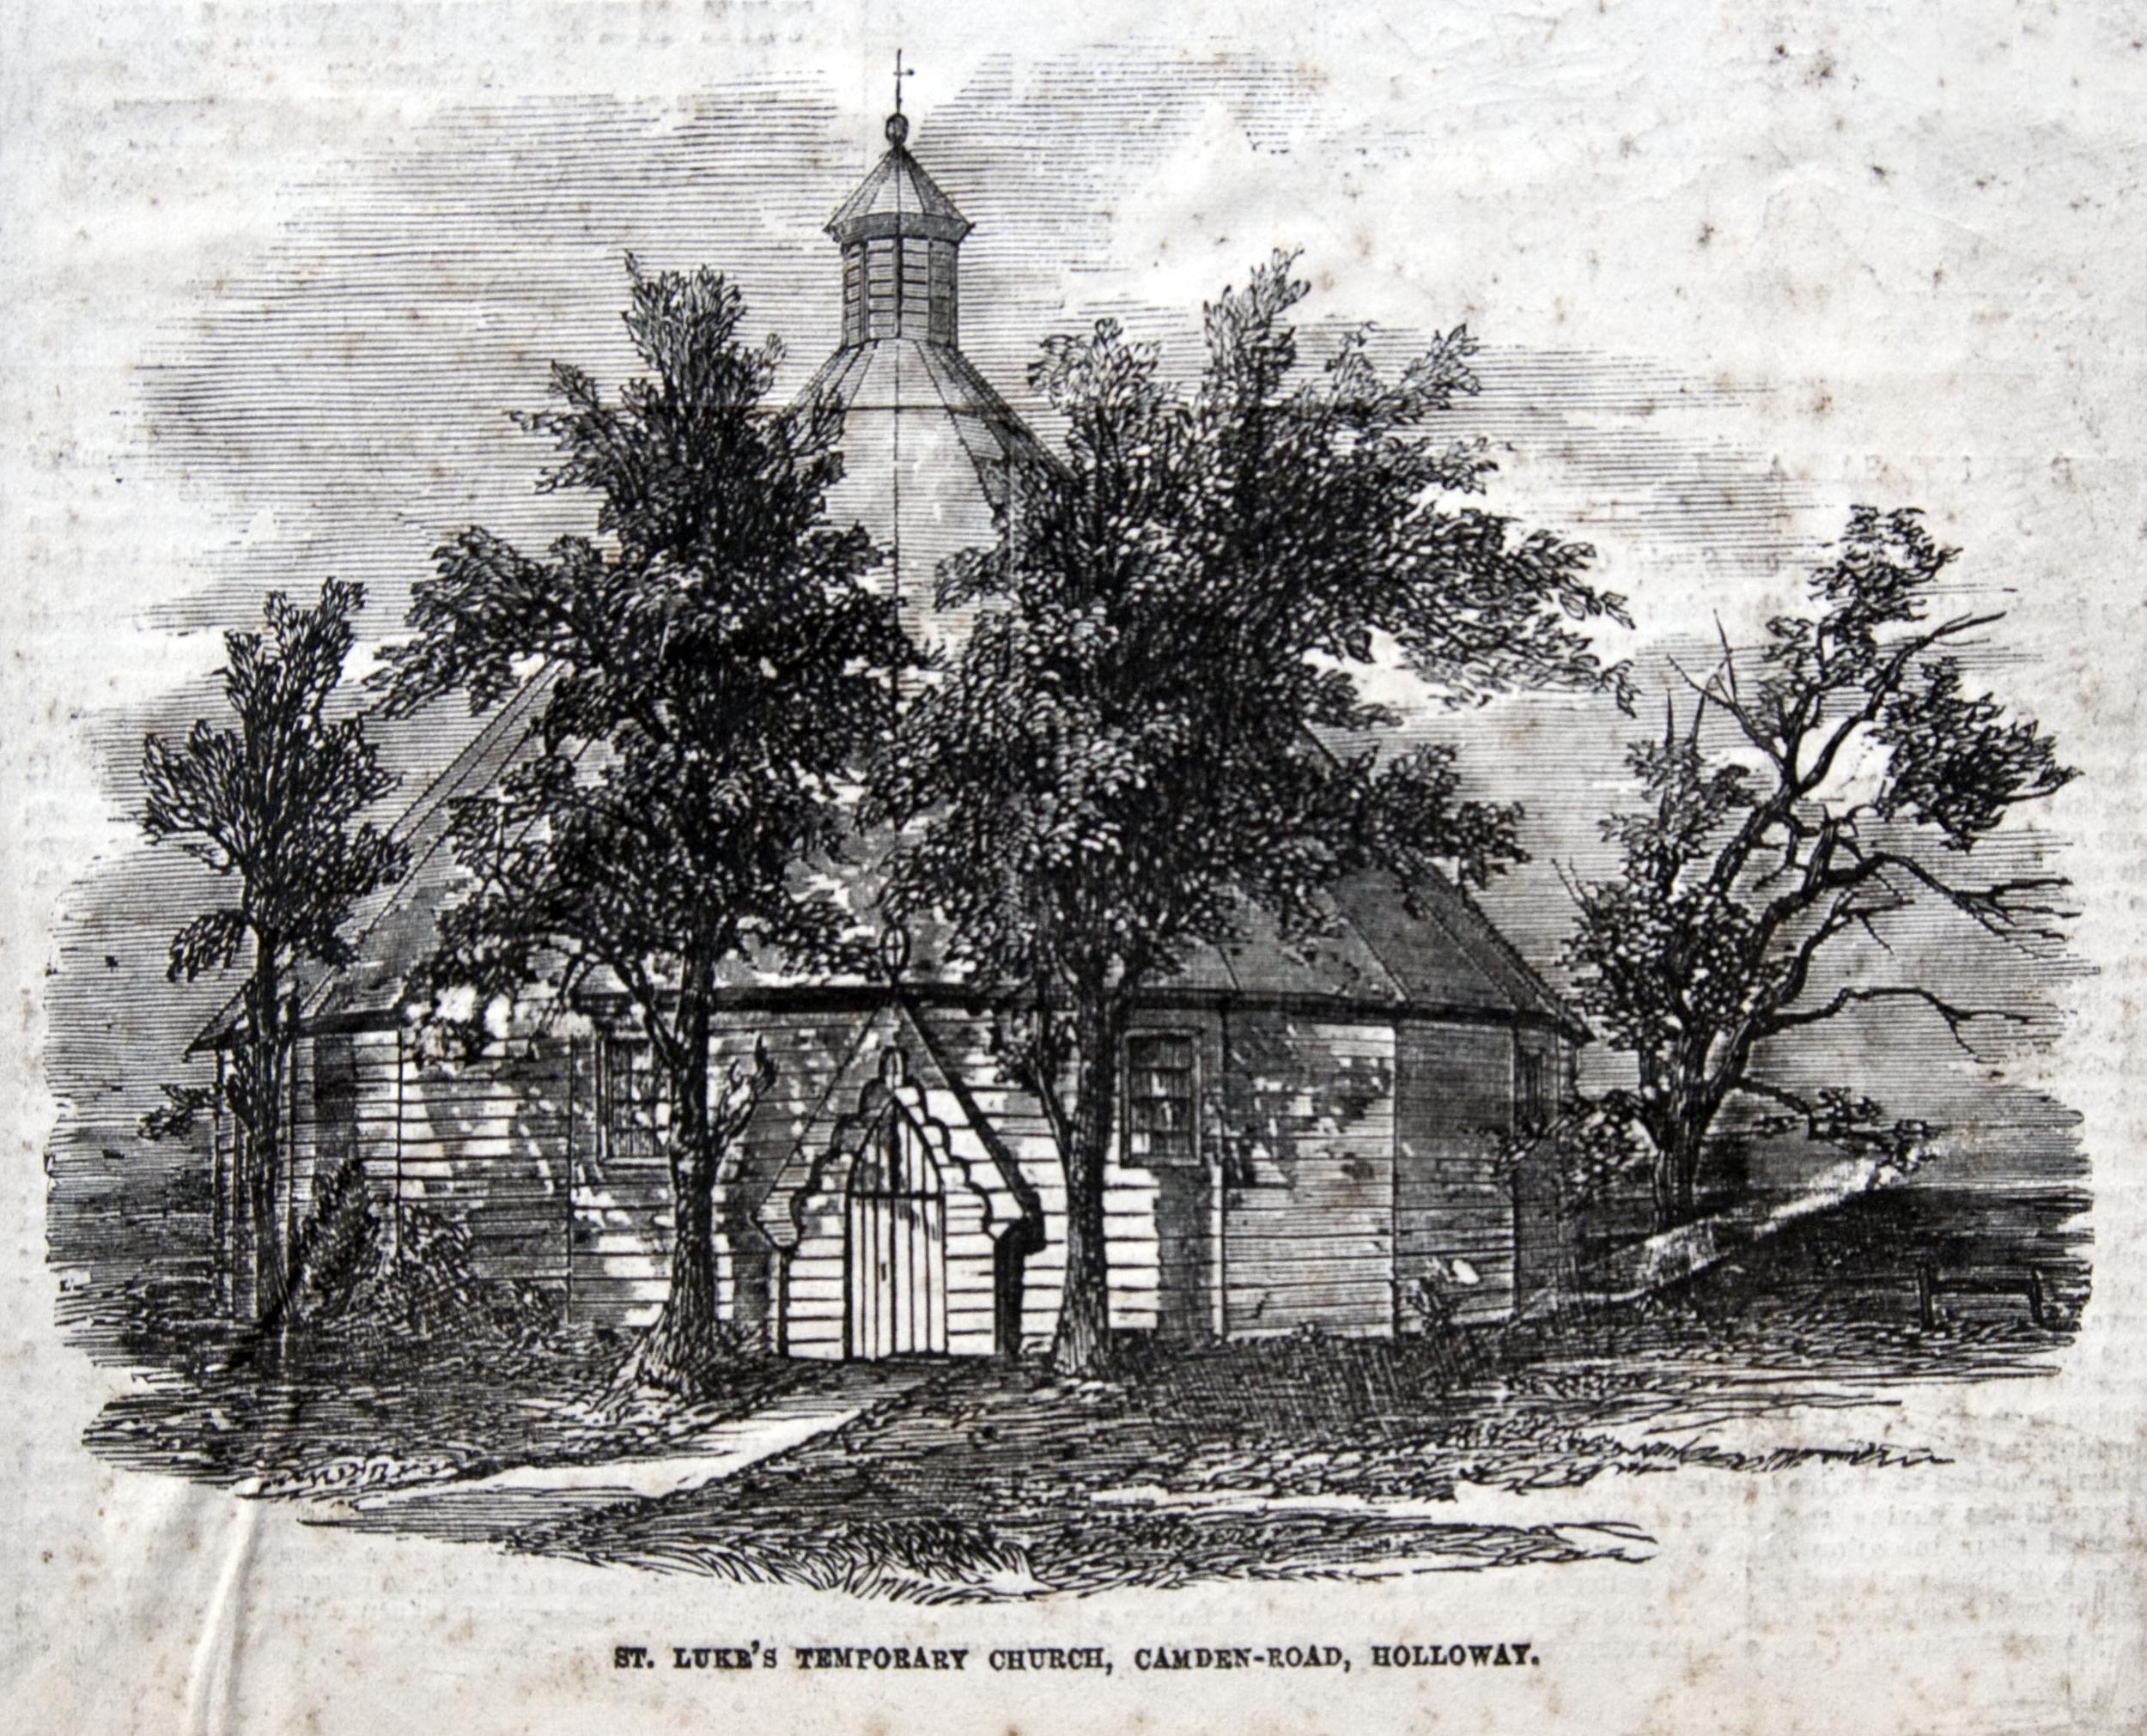 St. Luke's Temporary Church, Camden Road, Holloway.png